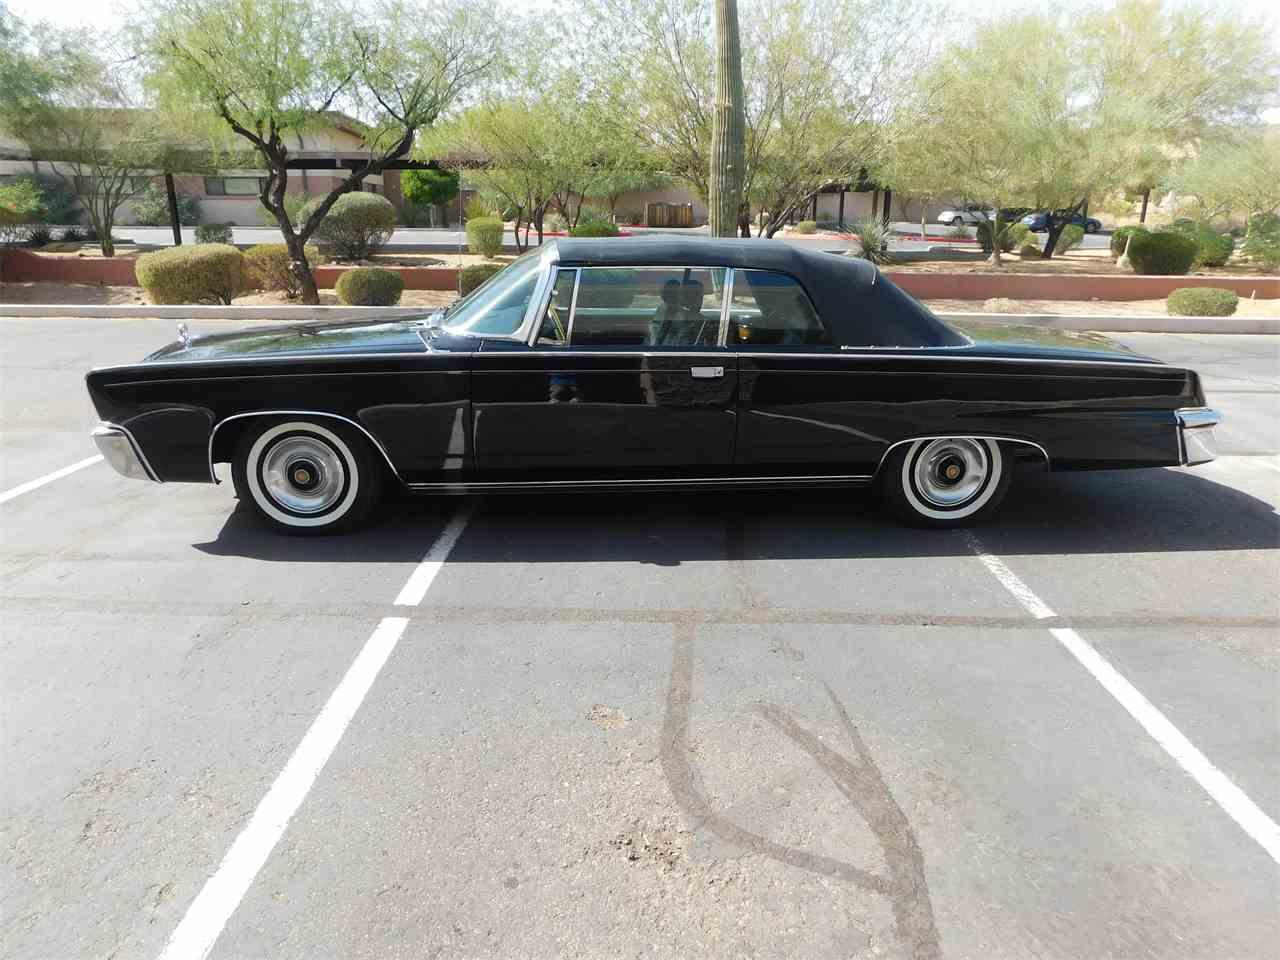 1956 chrysler imperial interior images - 1965 Chrysler Imperial 1034917